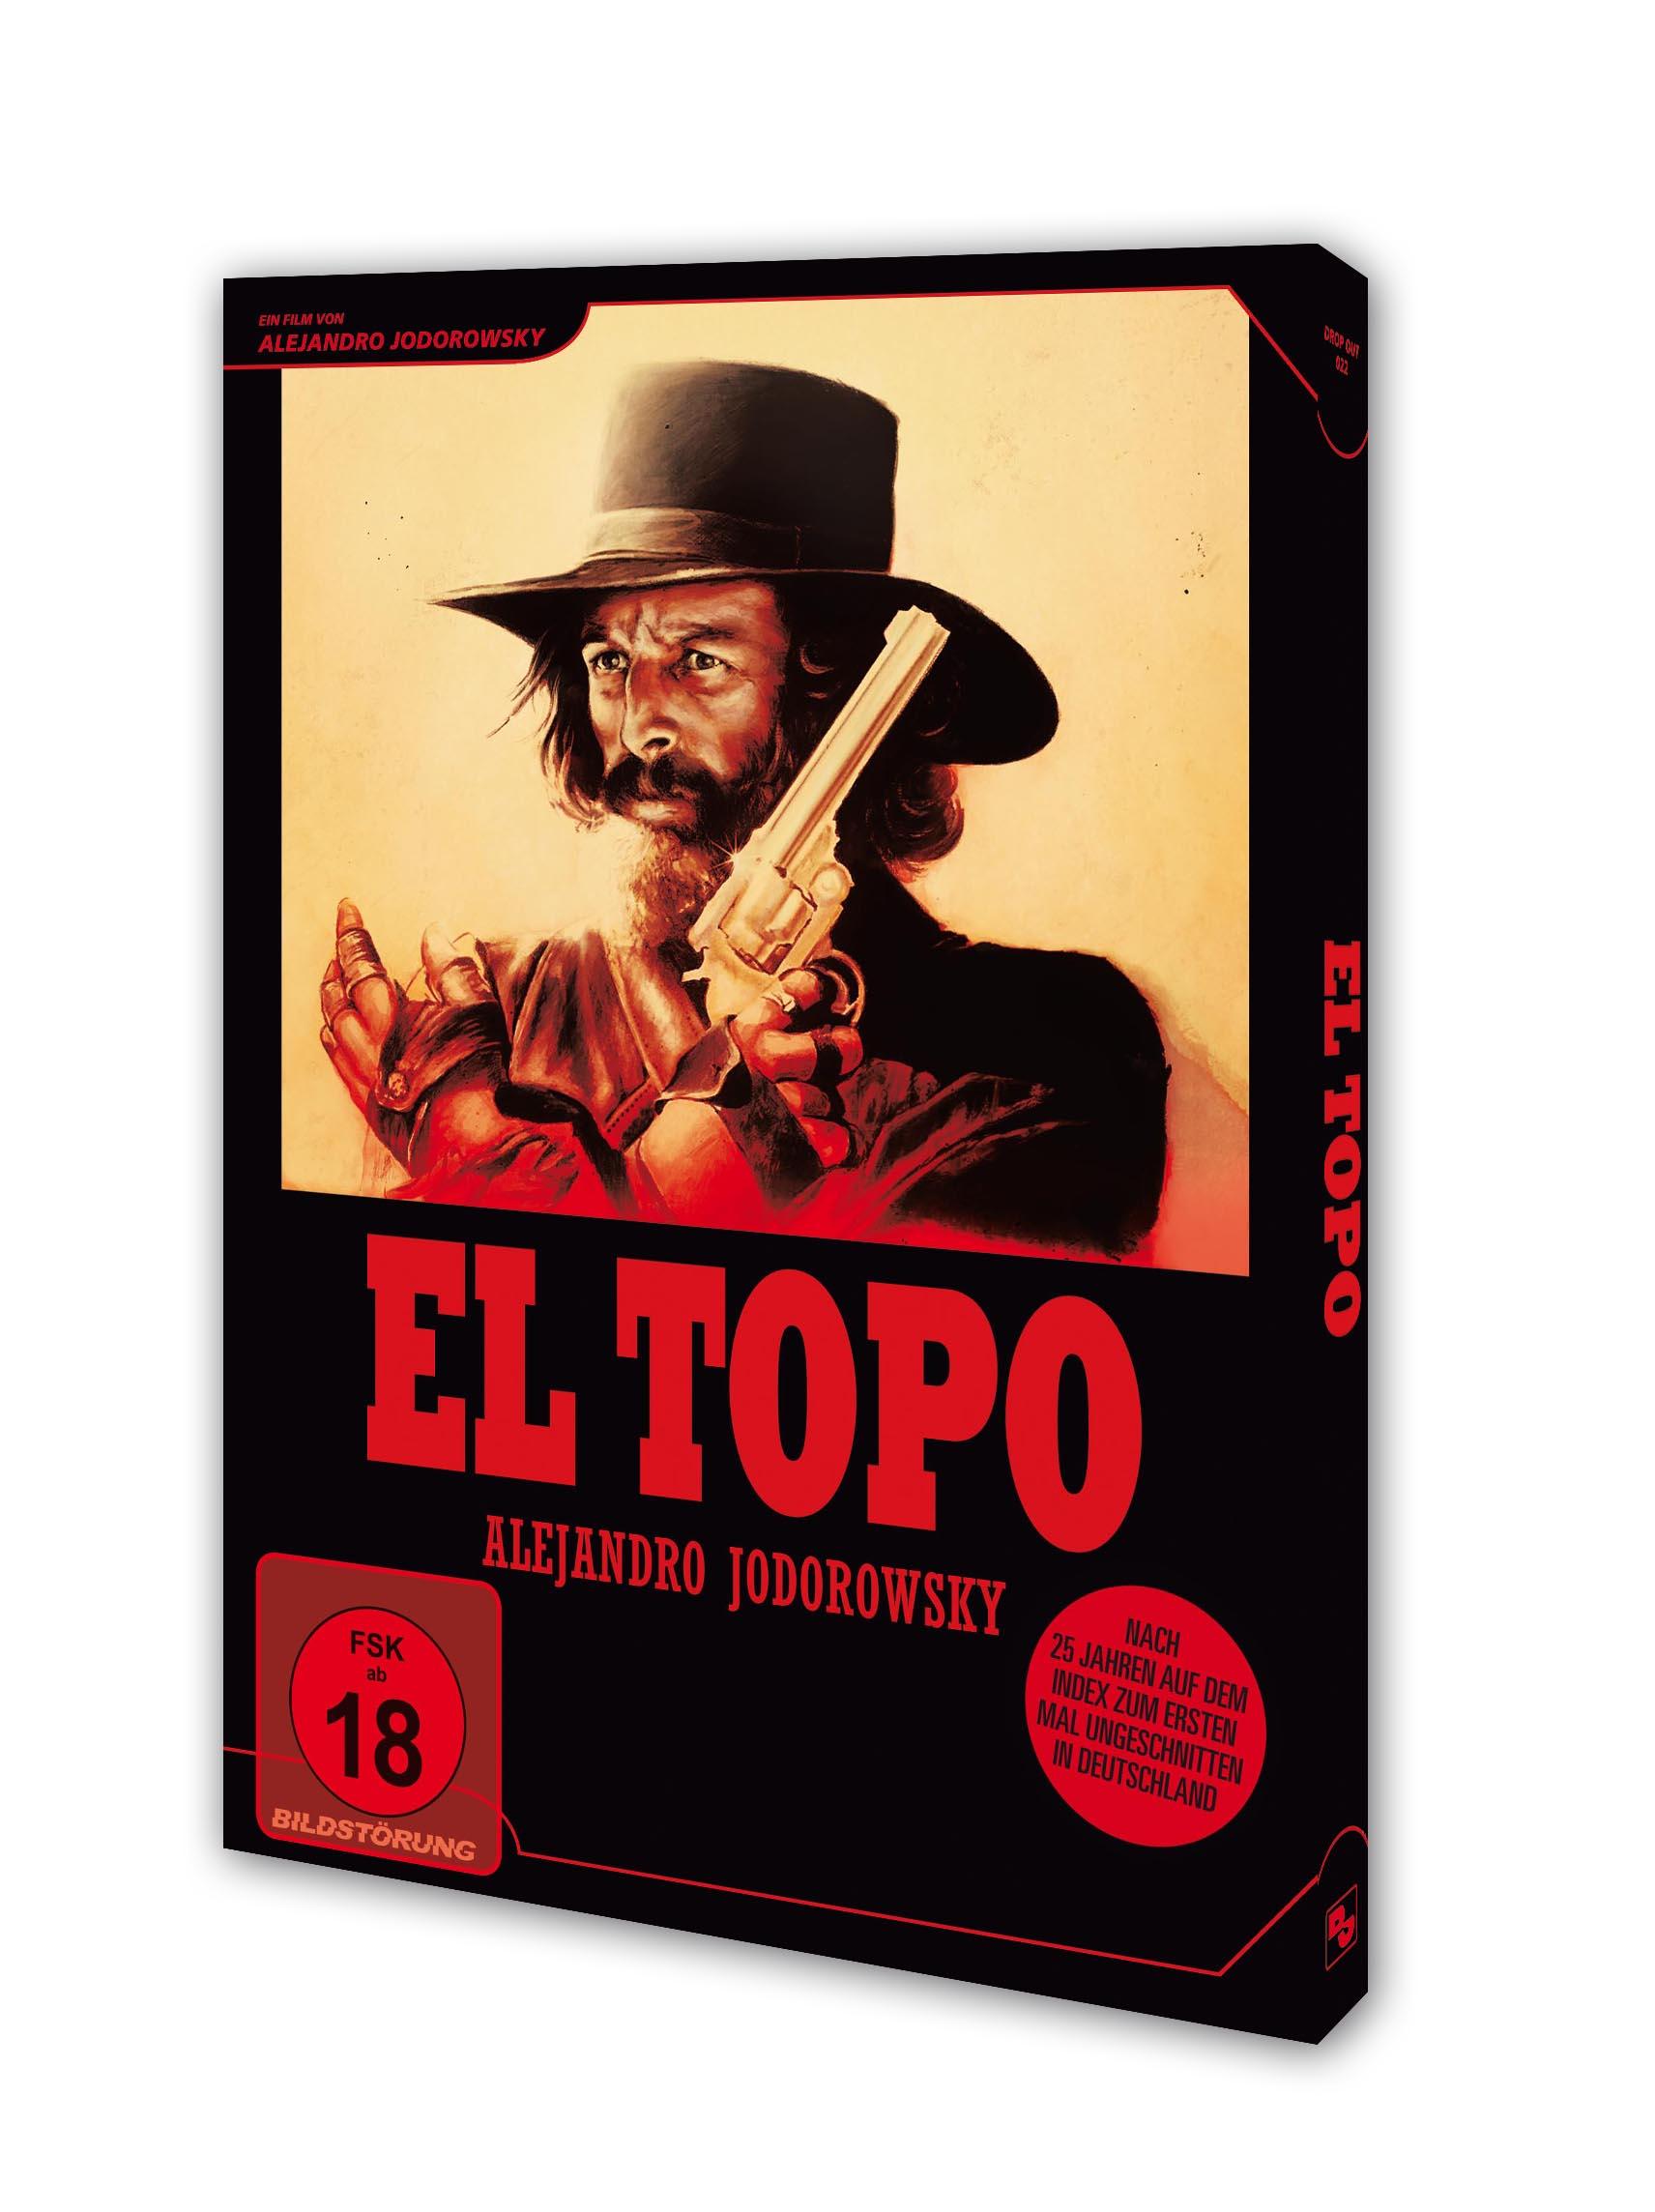 EL TOPO  DVD Packshot